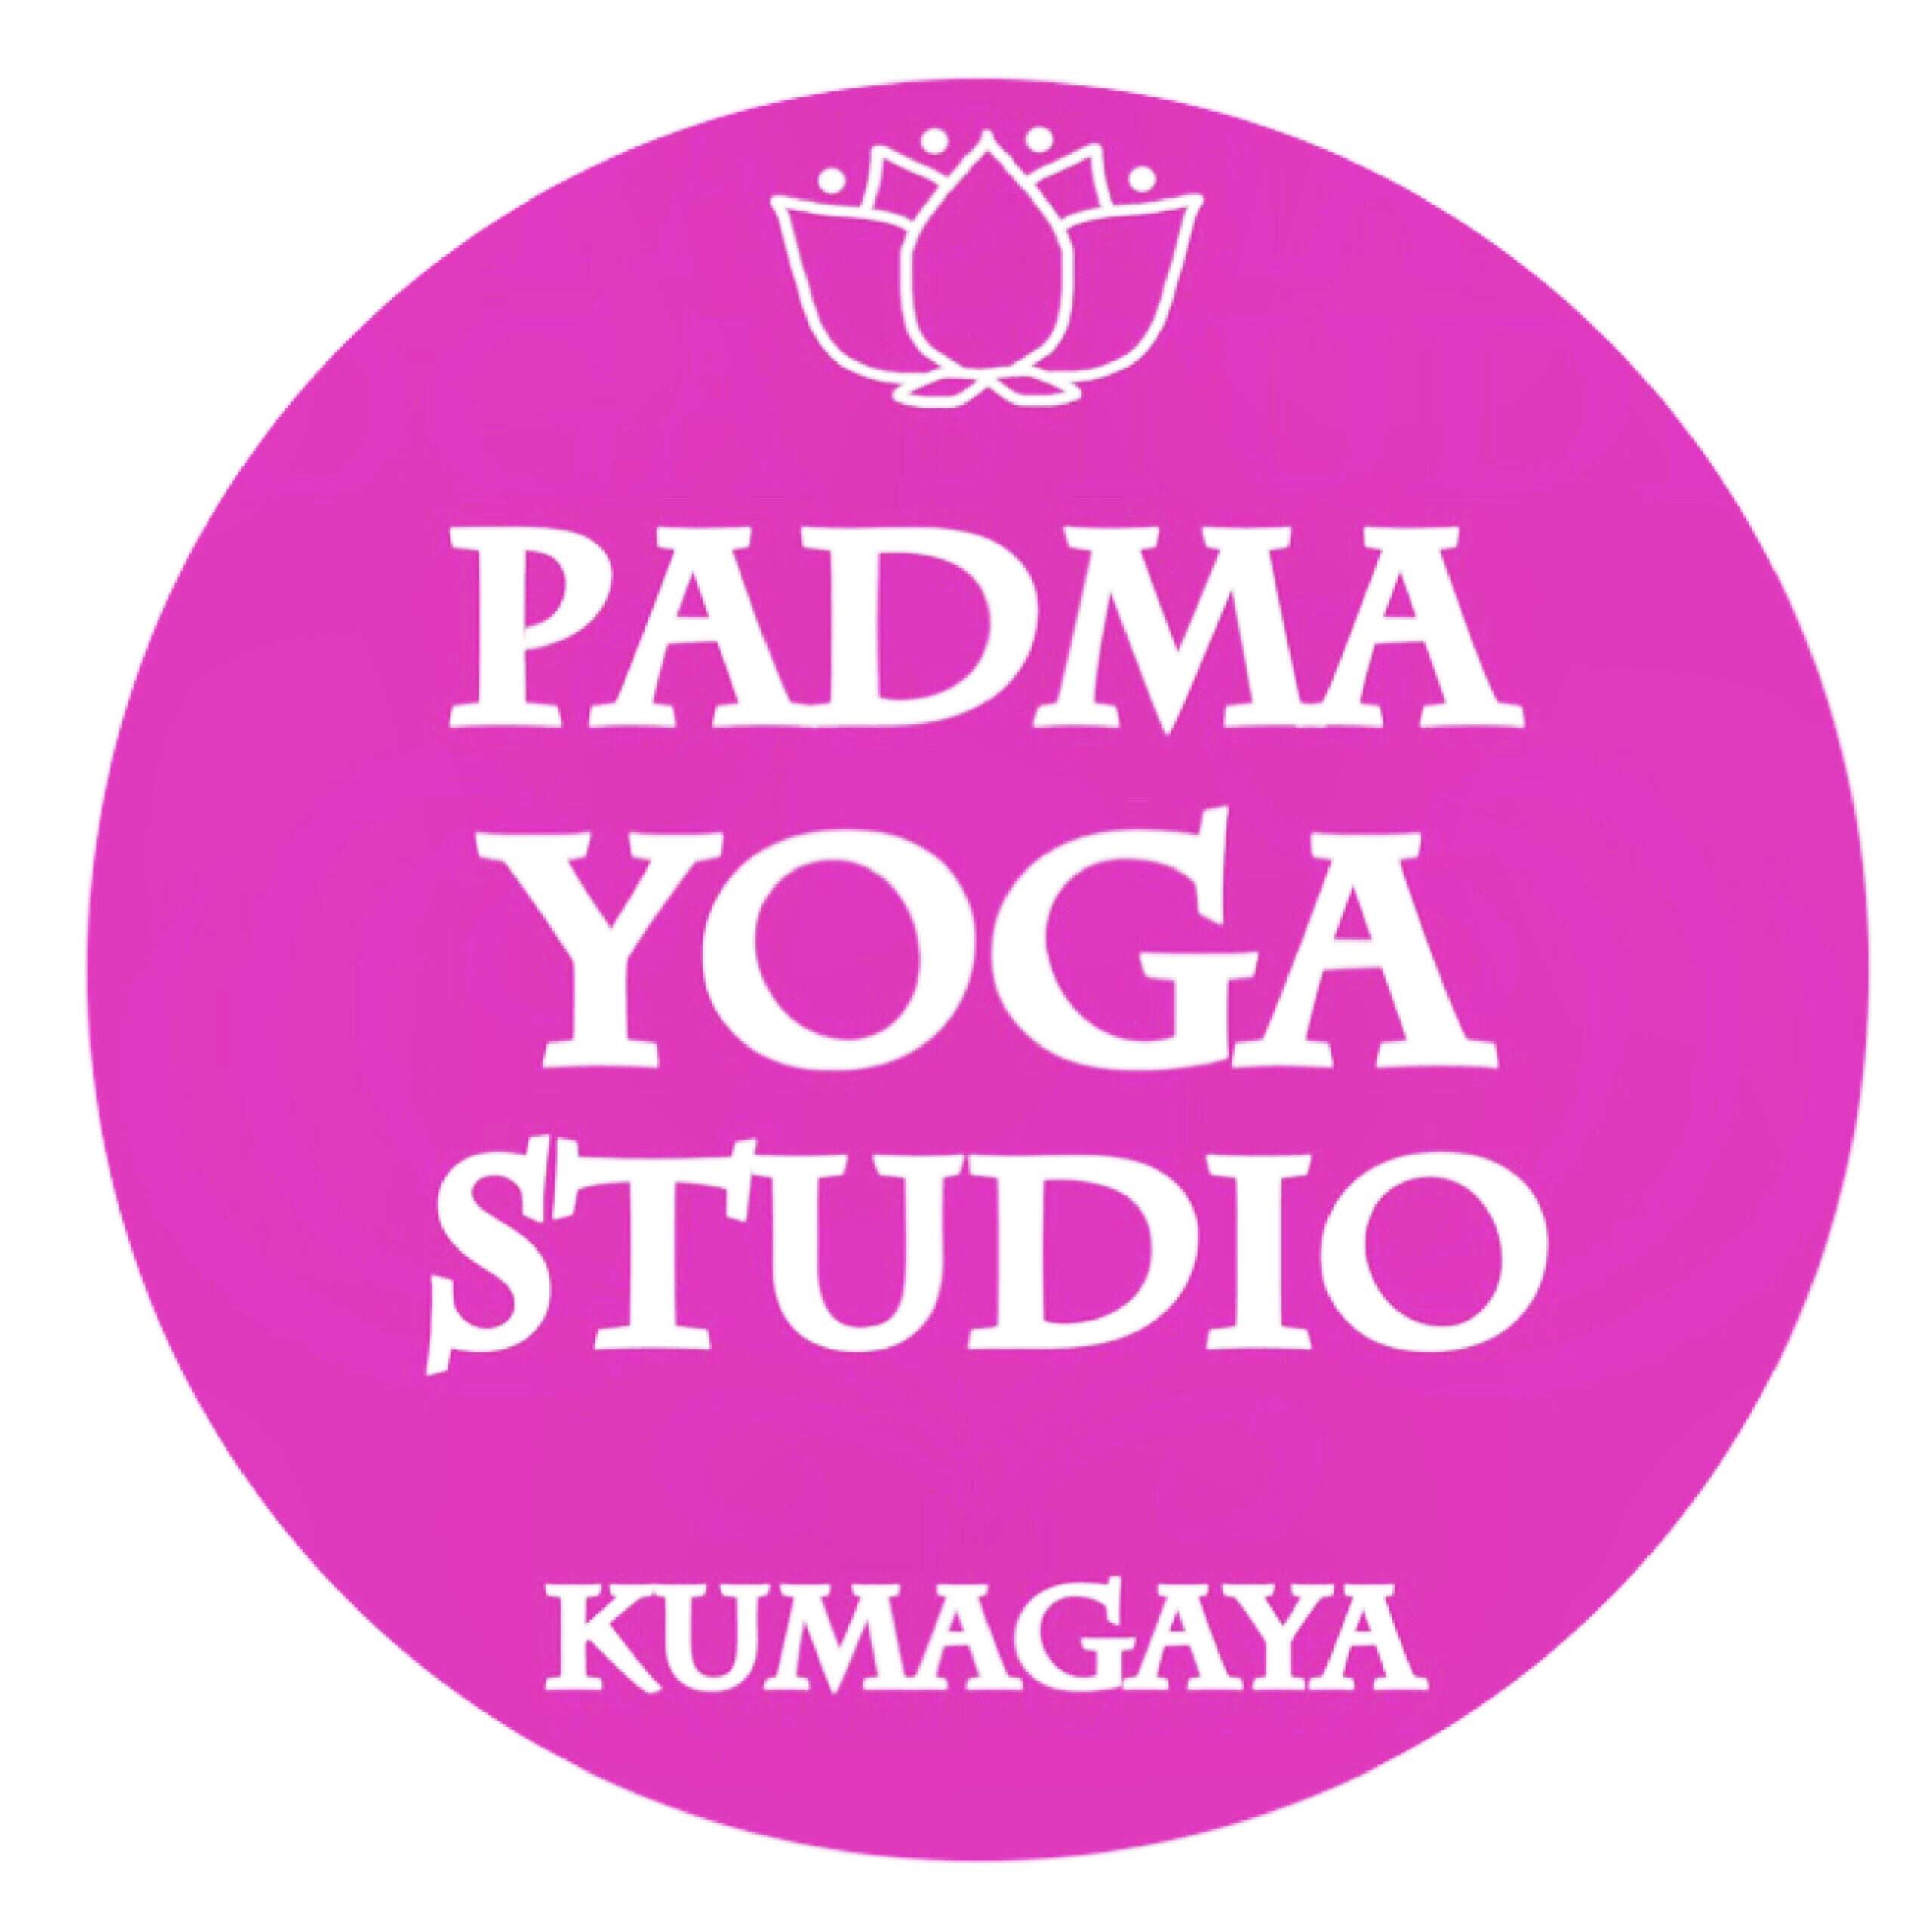 PADMA YOGA STUDIO KUMAGAYA